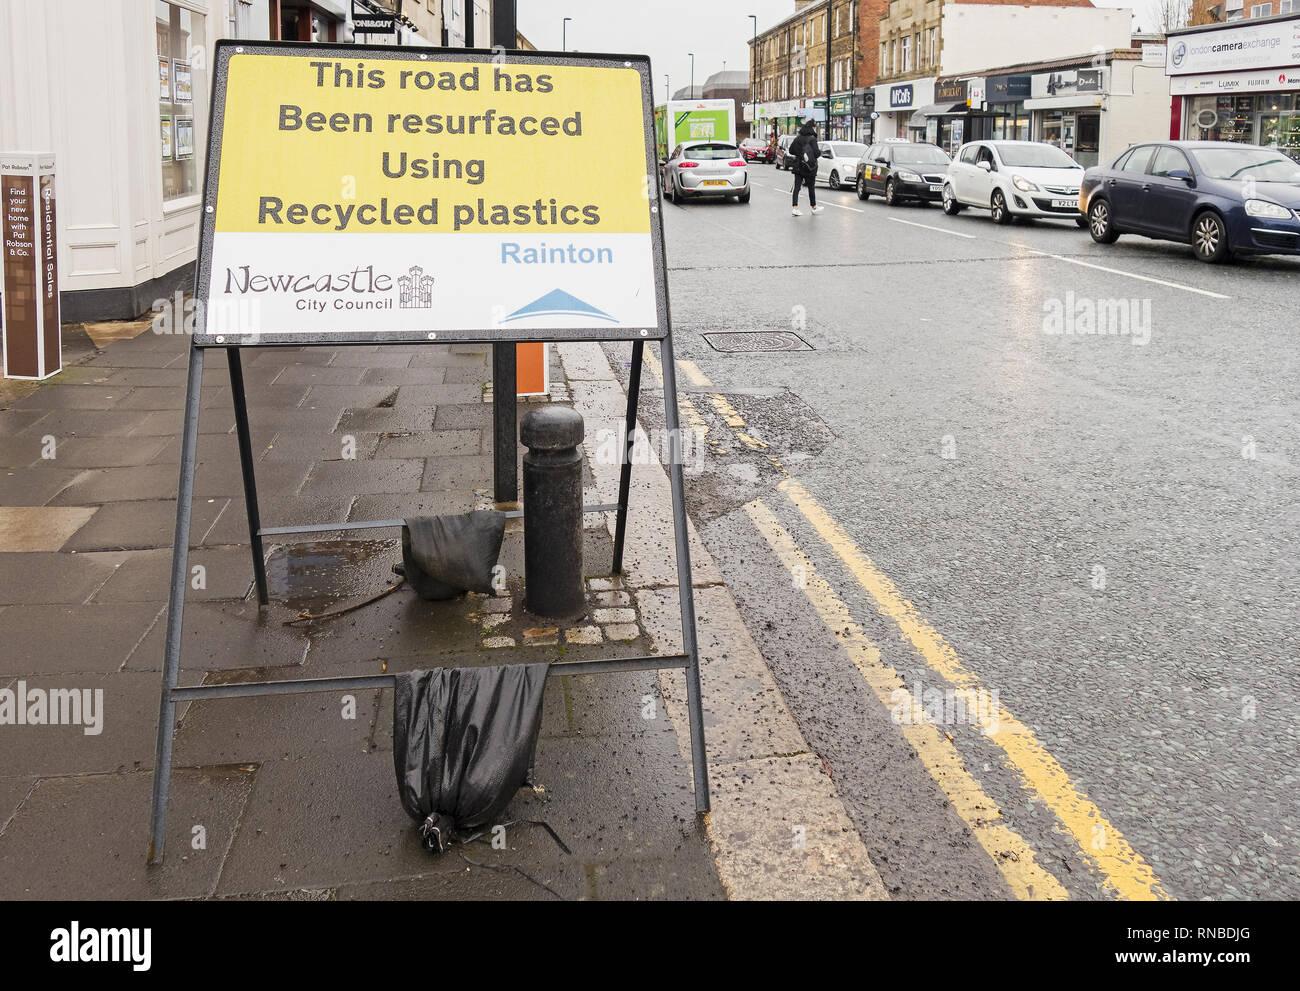 Plastics used to resurface UK roads. - Stock Image